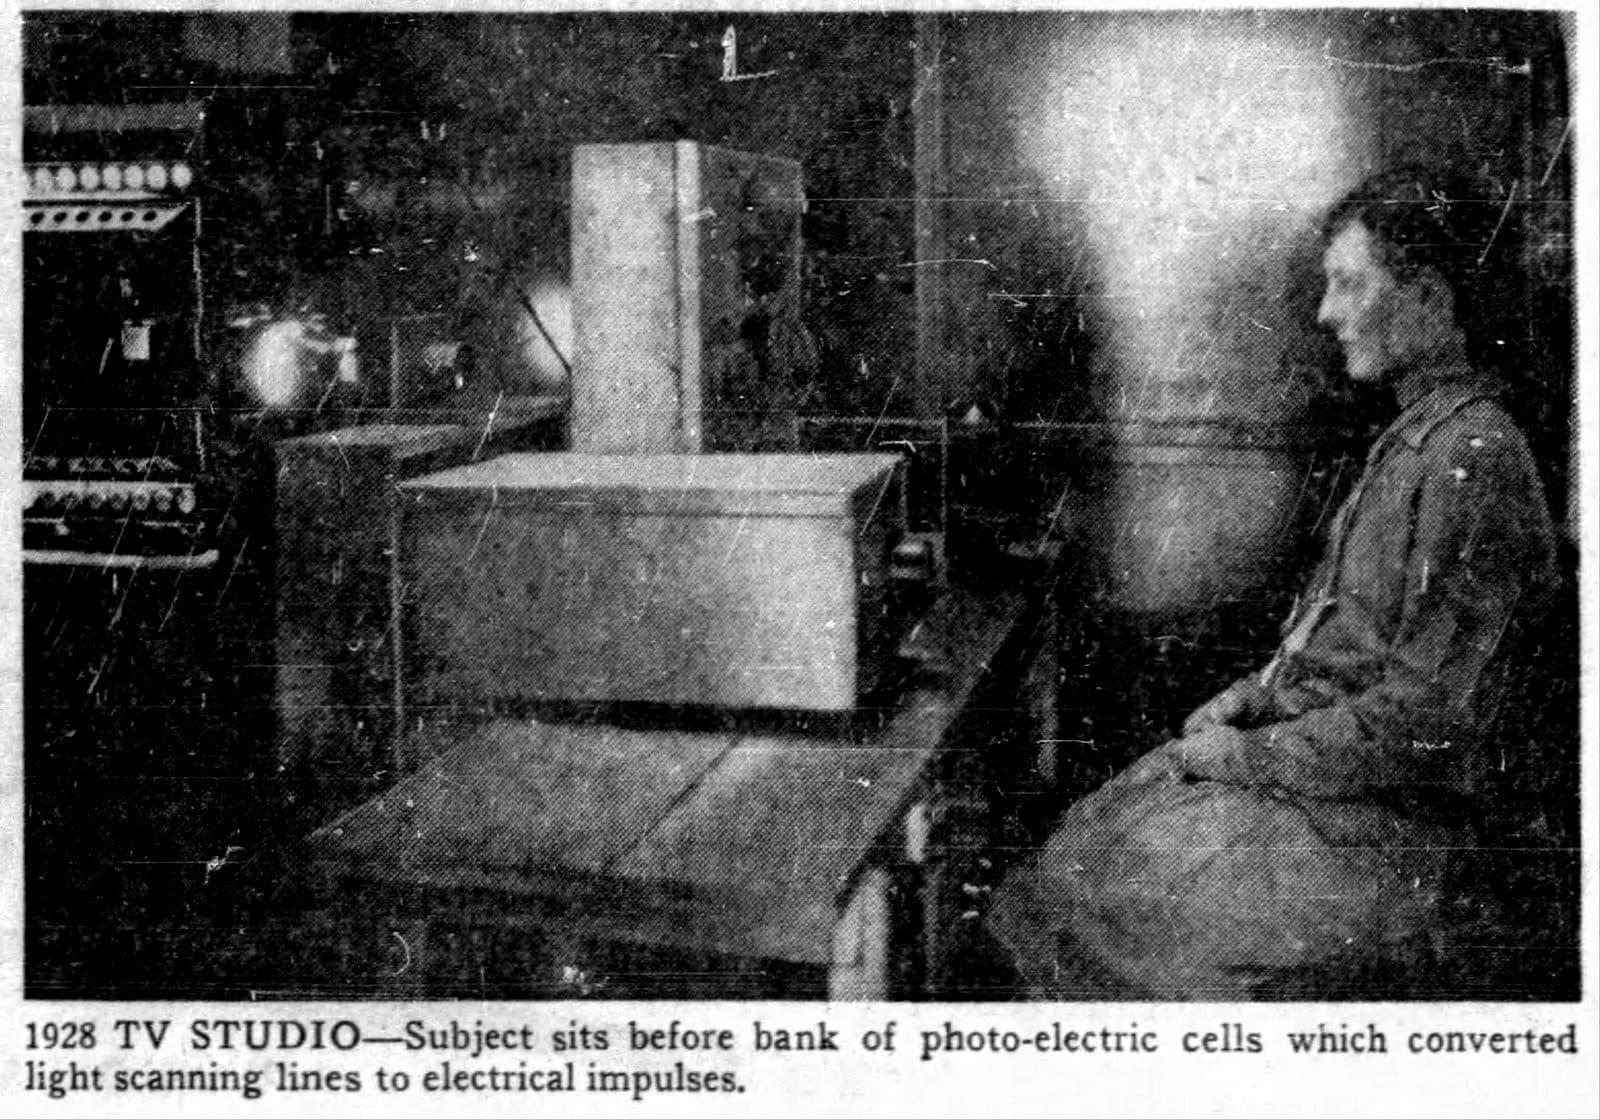 Vintage TV studio in 1928